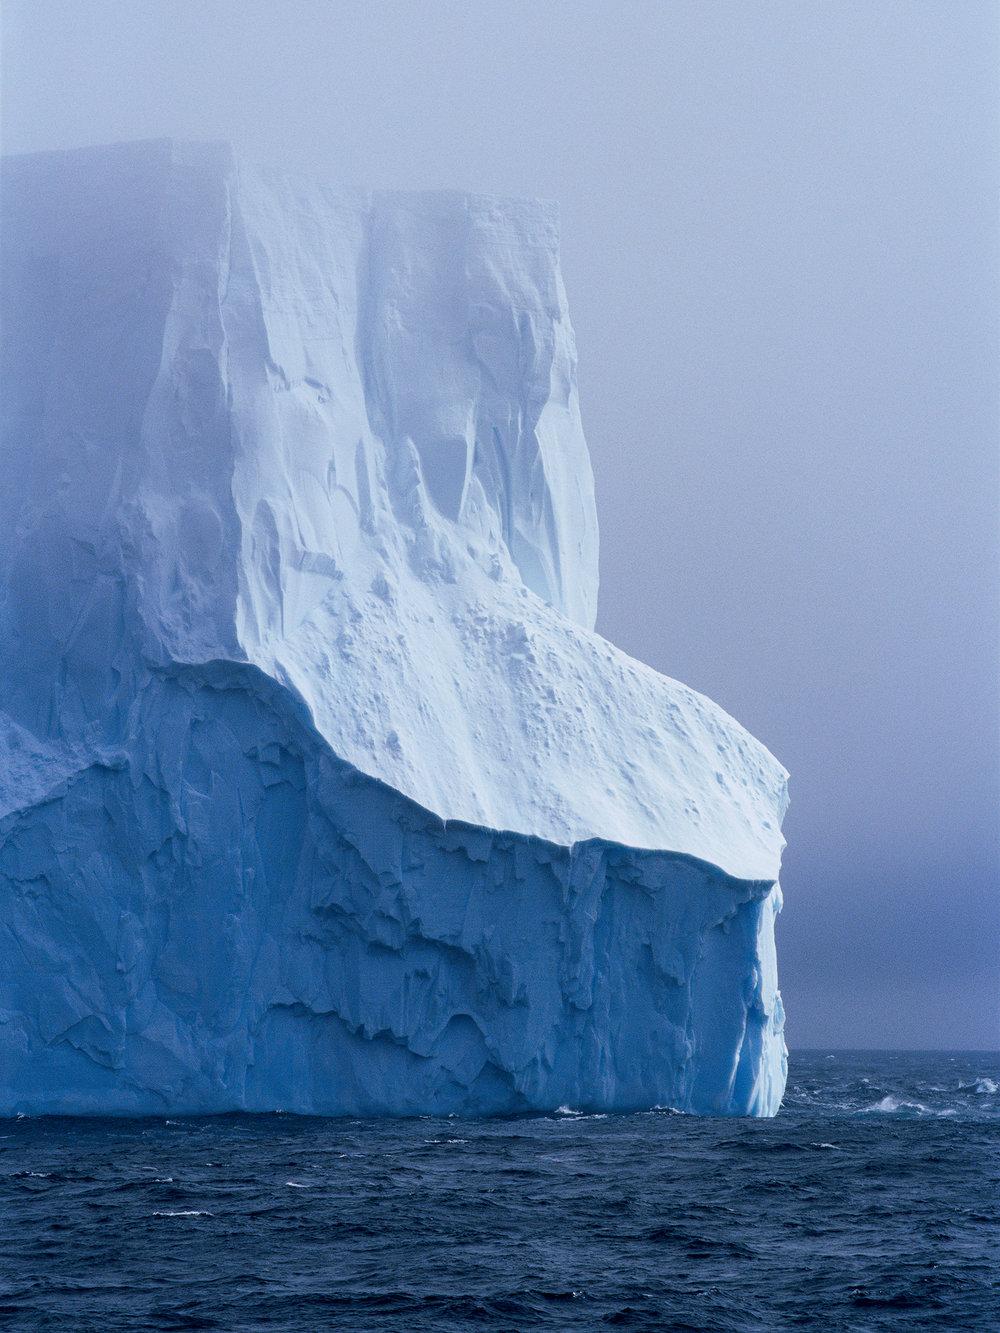 Antarctica_35_E100_7_sRGB.JPG